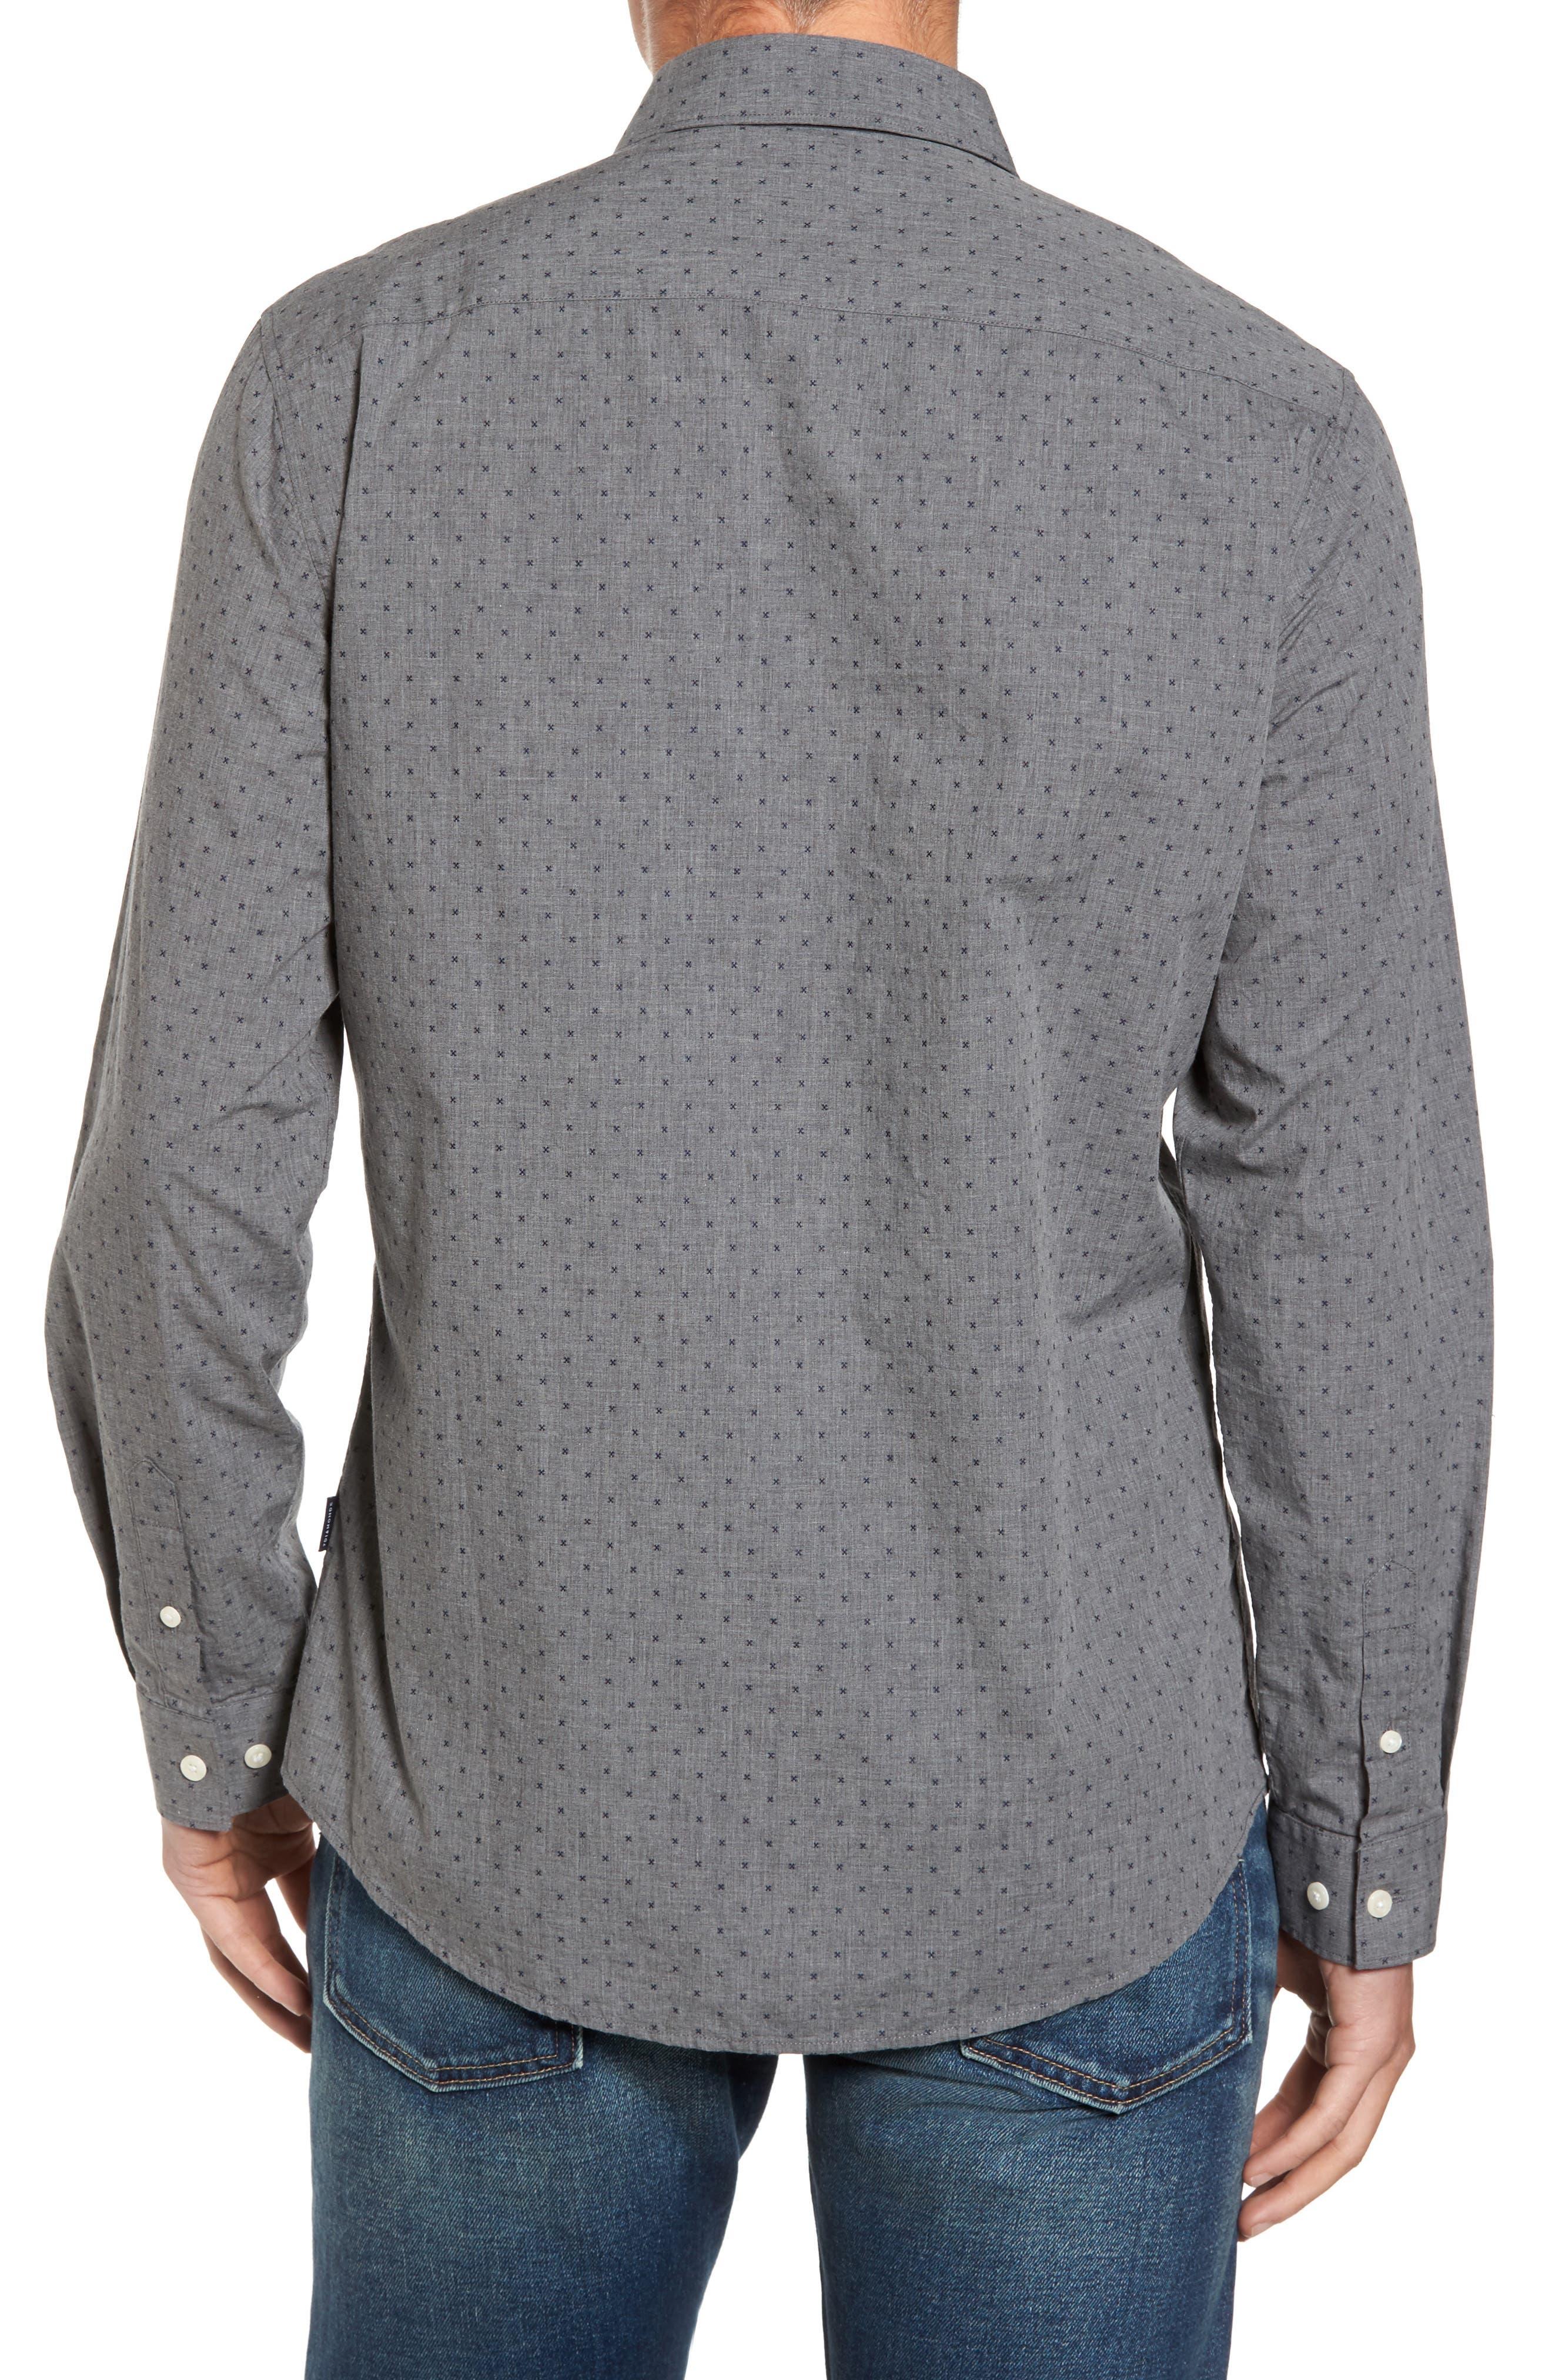 Steel Sky Woven Shirt,                             Alternate thumbnail 2, color,                             Navy